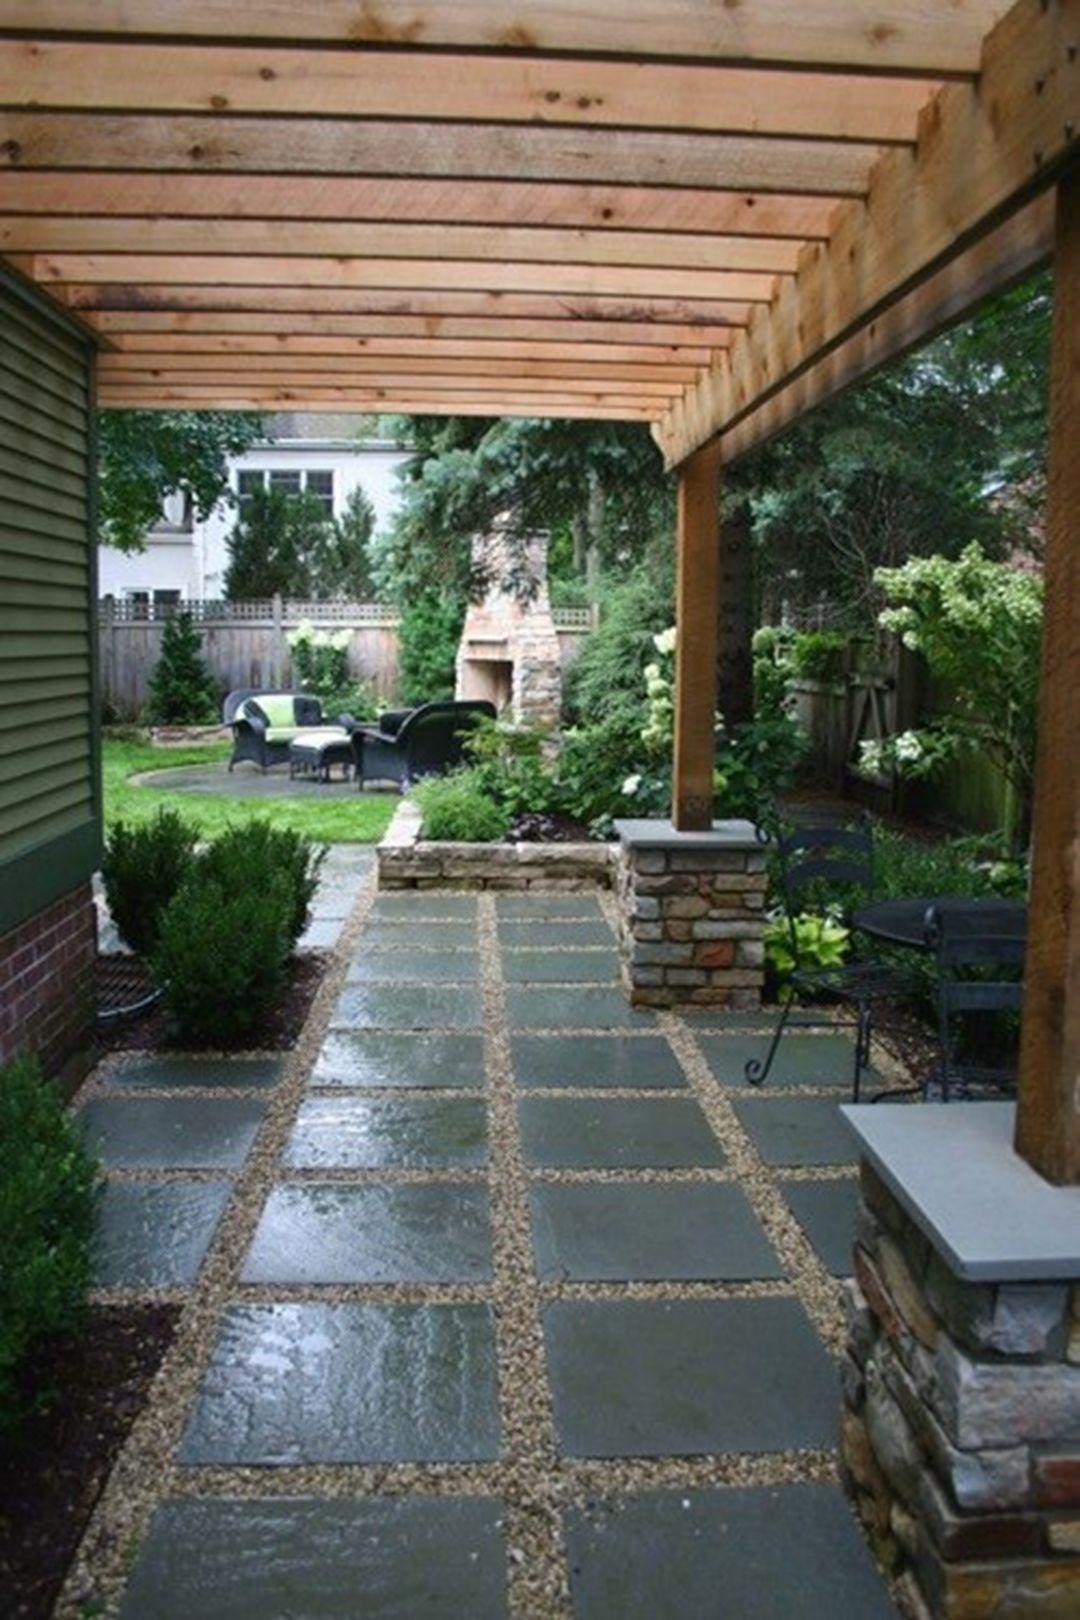 15 Amazing Simple Paver Patio Designs For Your Home Outdoor Patio Backyard Patio Backyard